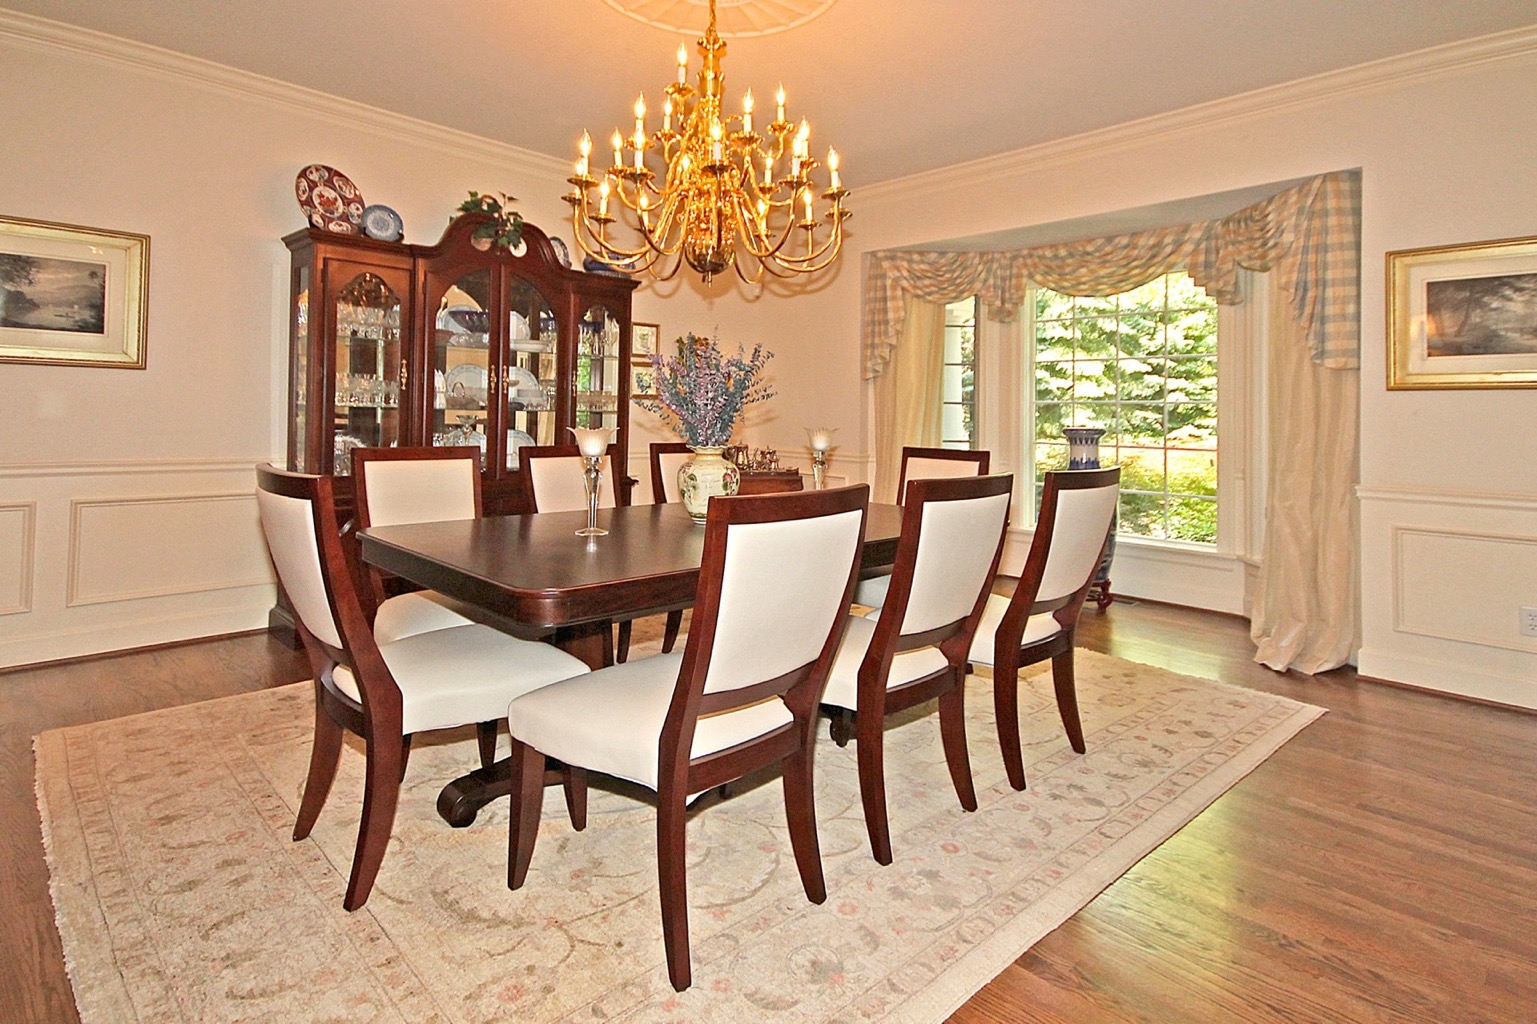 diningroom1_edit.jpg